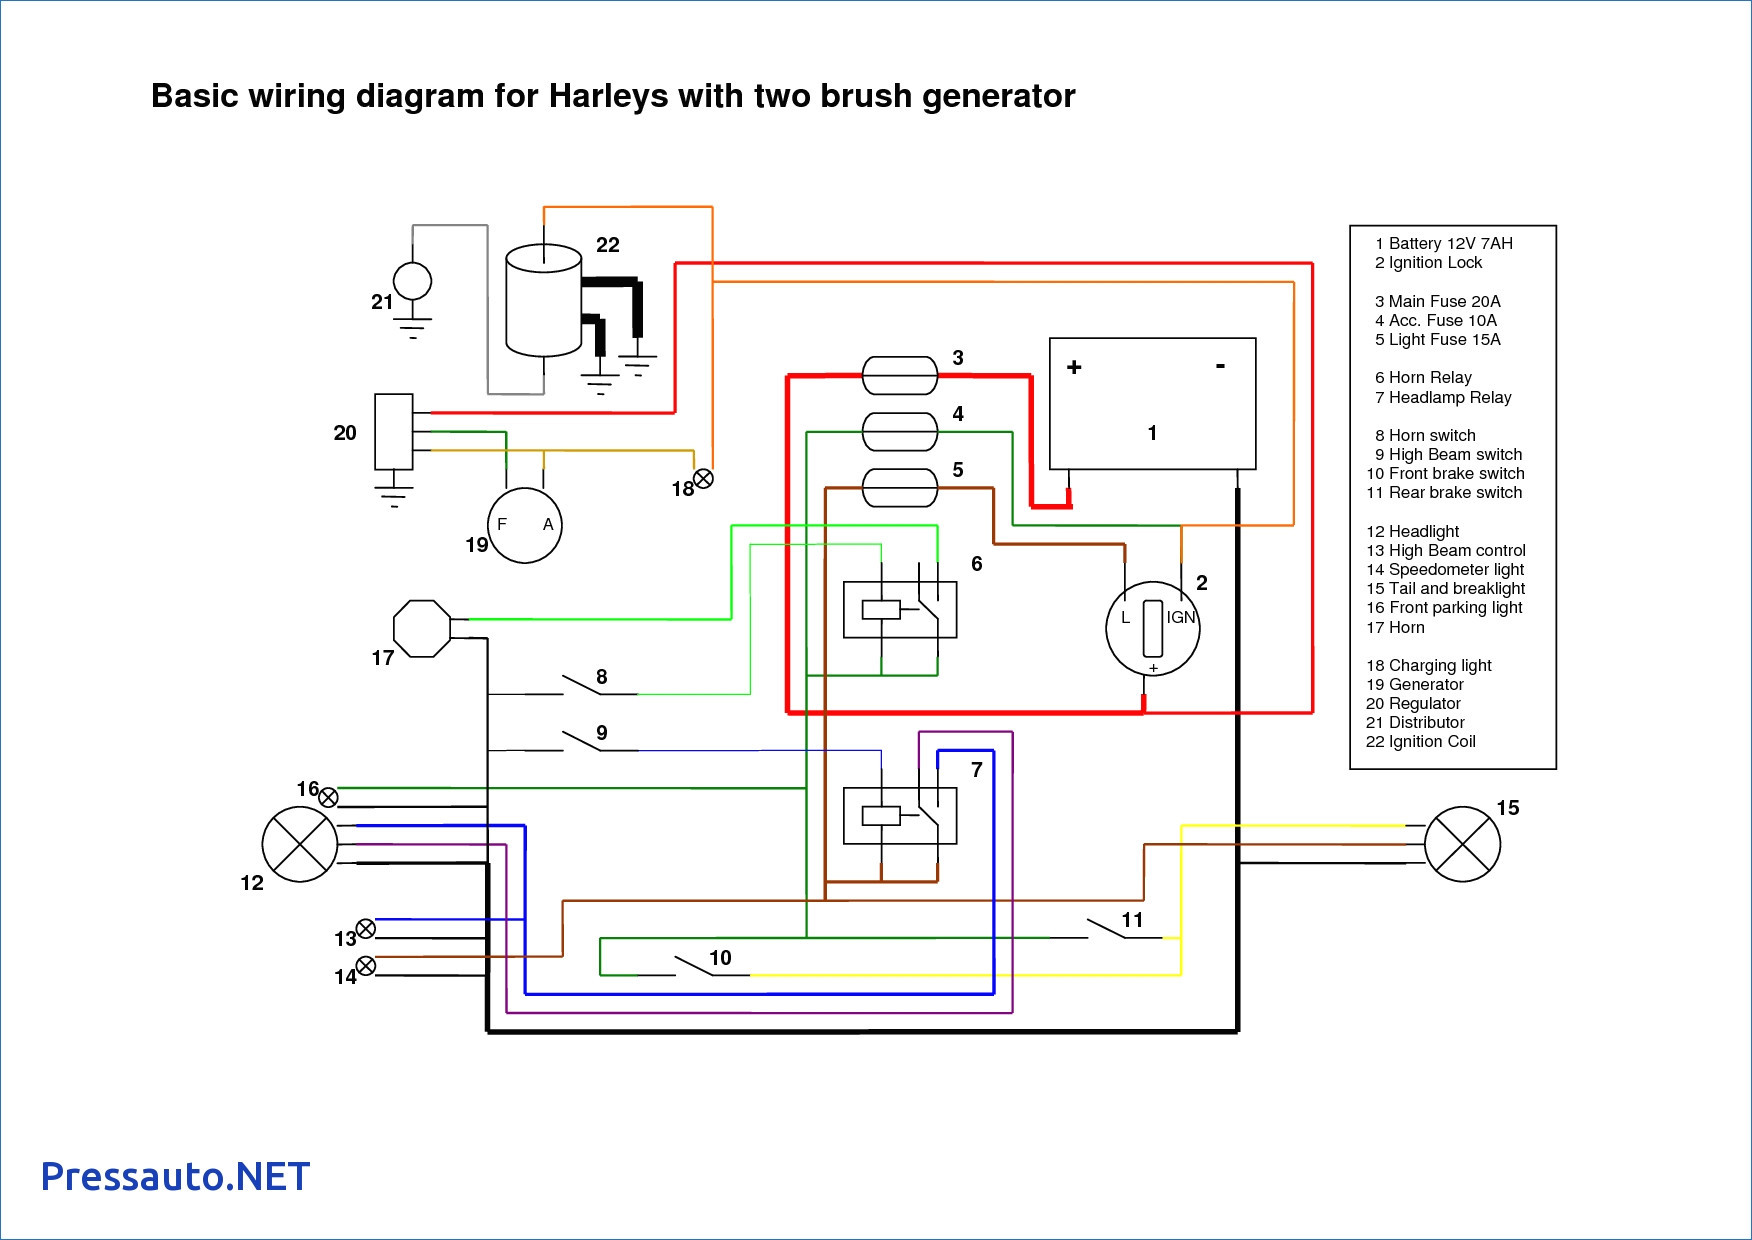 Kk 6840 Tecumseh Condensing Unit Wiring Diagram Schematic Wiring